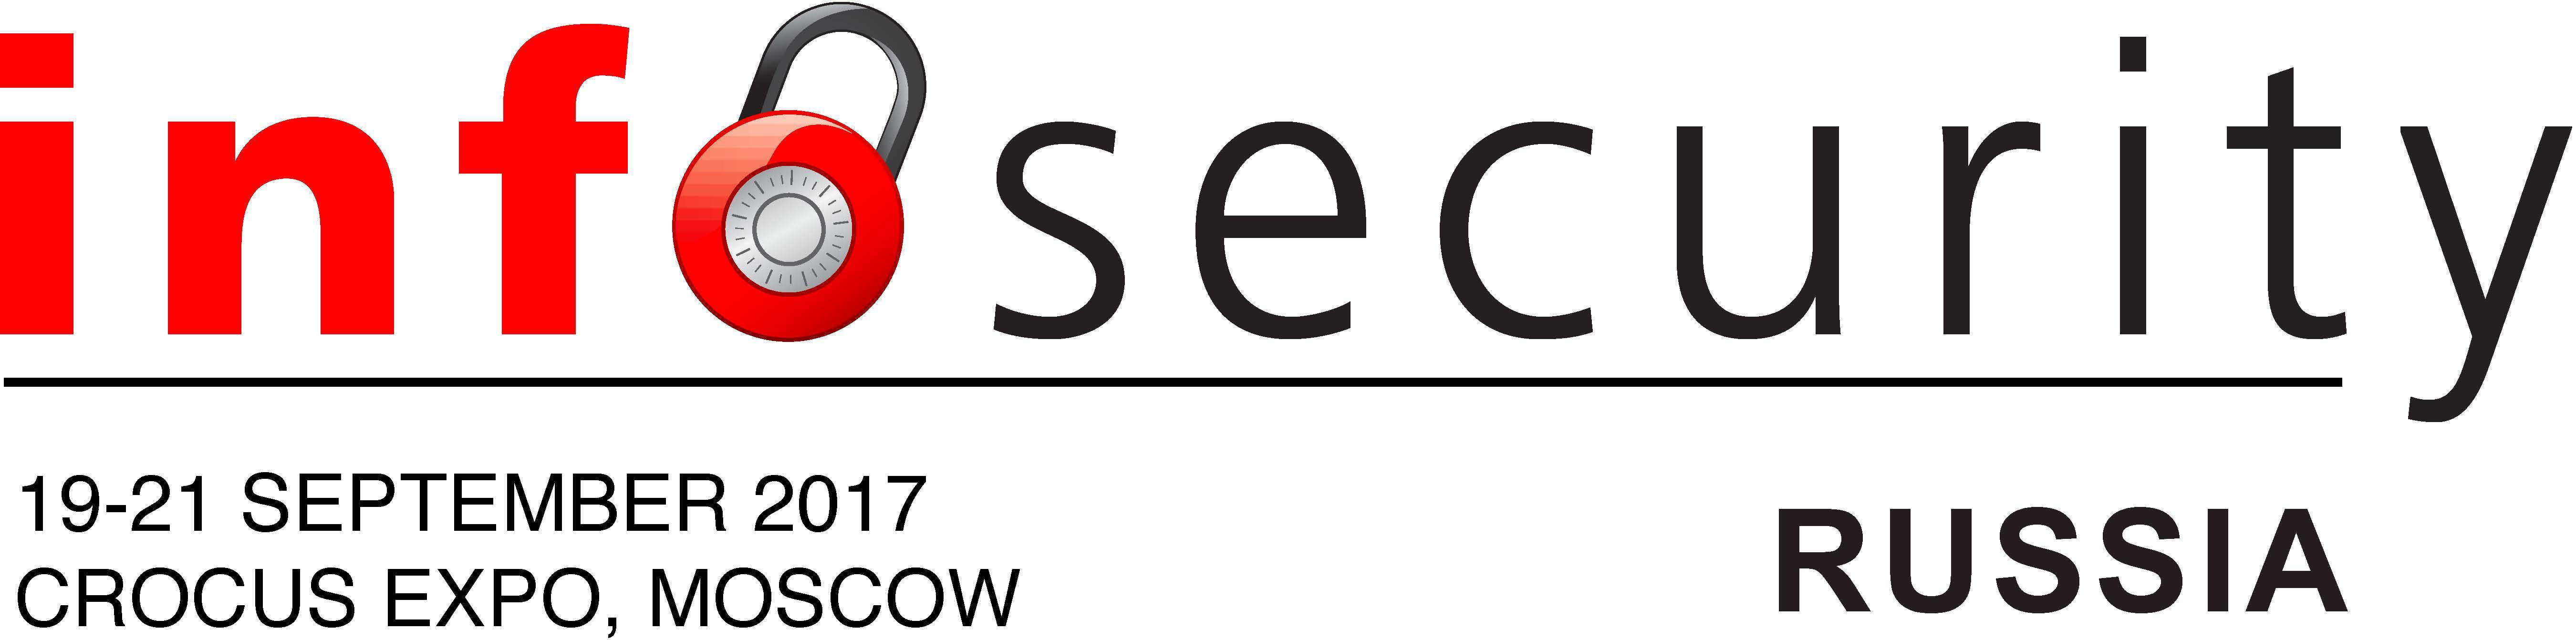 ISR_17_new logo copy-1.jpg